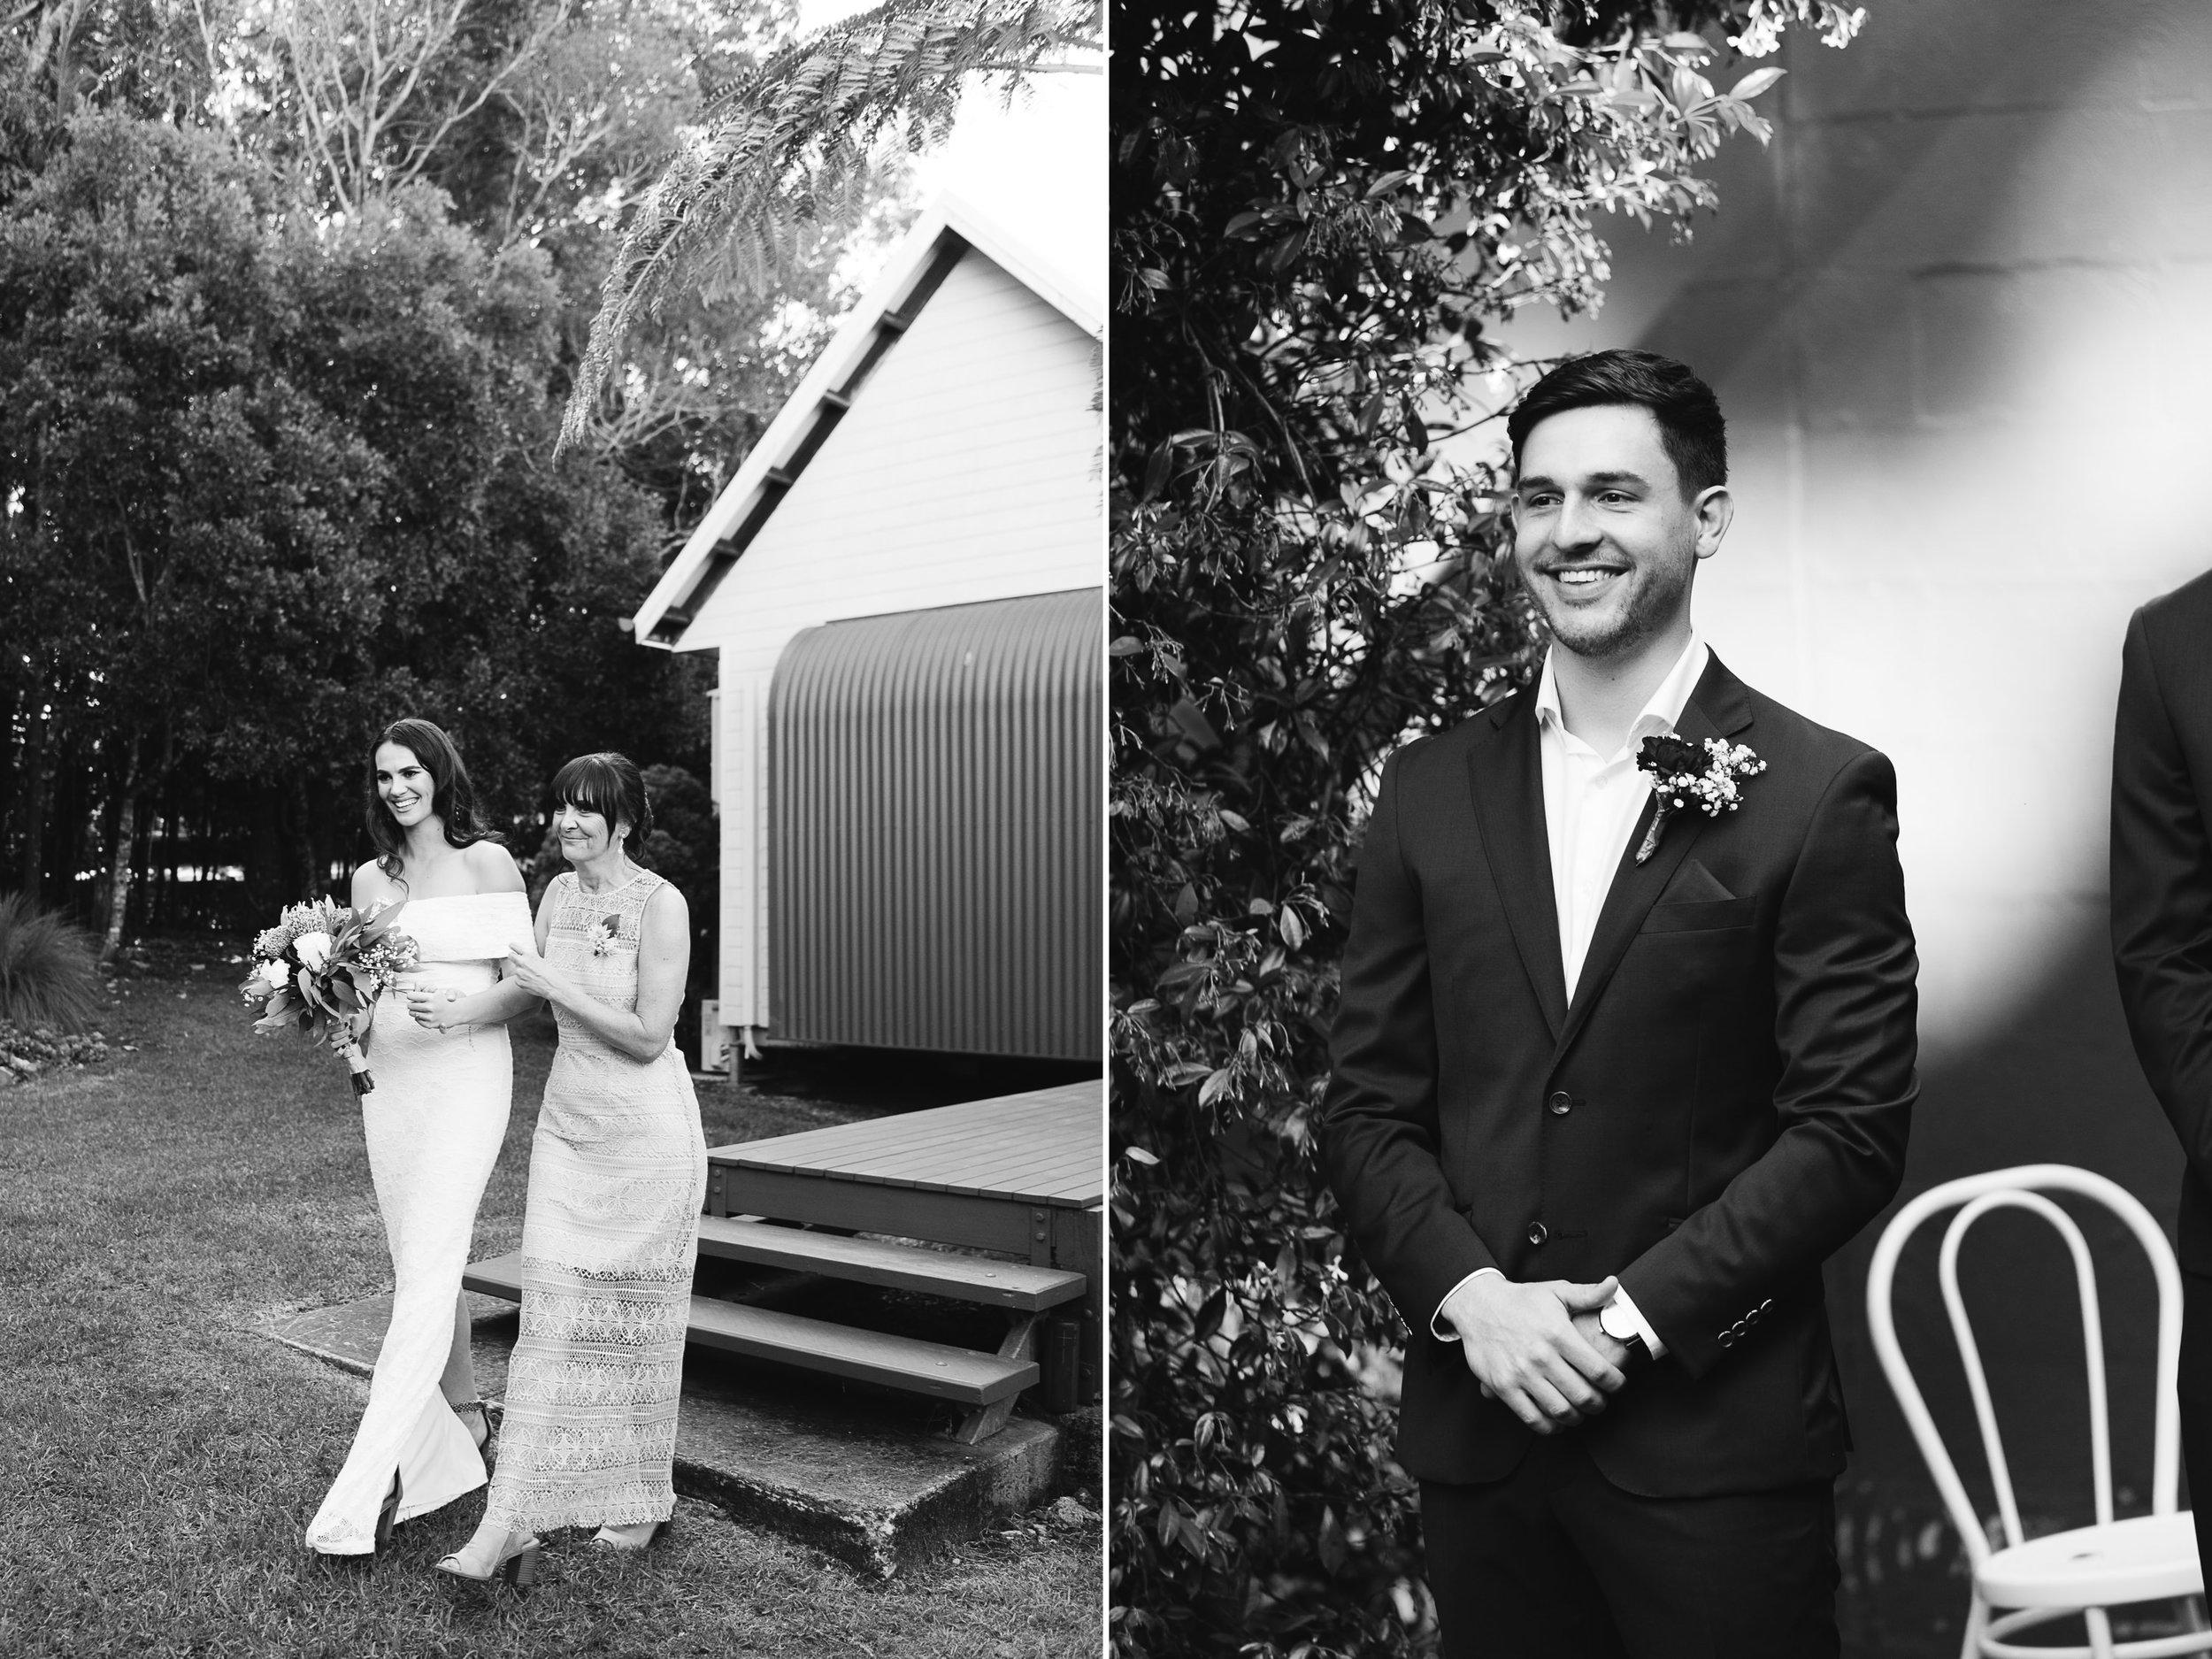 brisbane-gold-coast-sunshine-coast-wedding-photographer-mount-tamborine-wedding-18.jpg